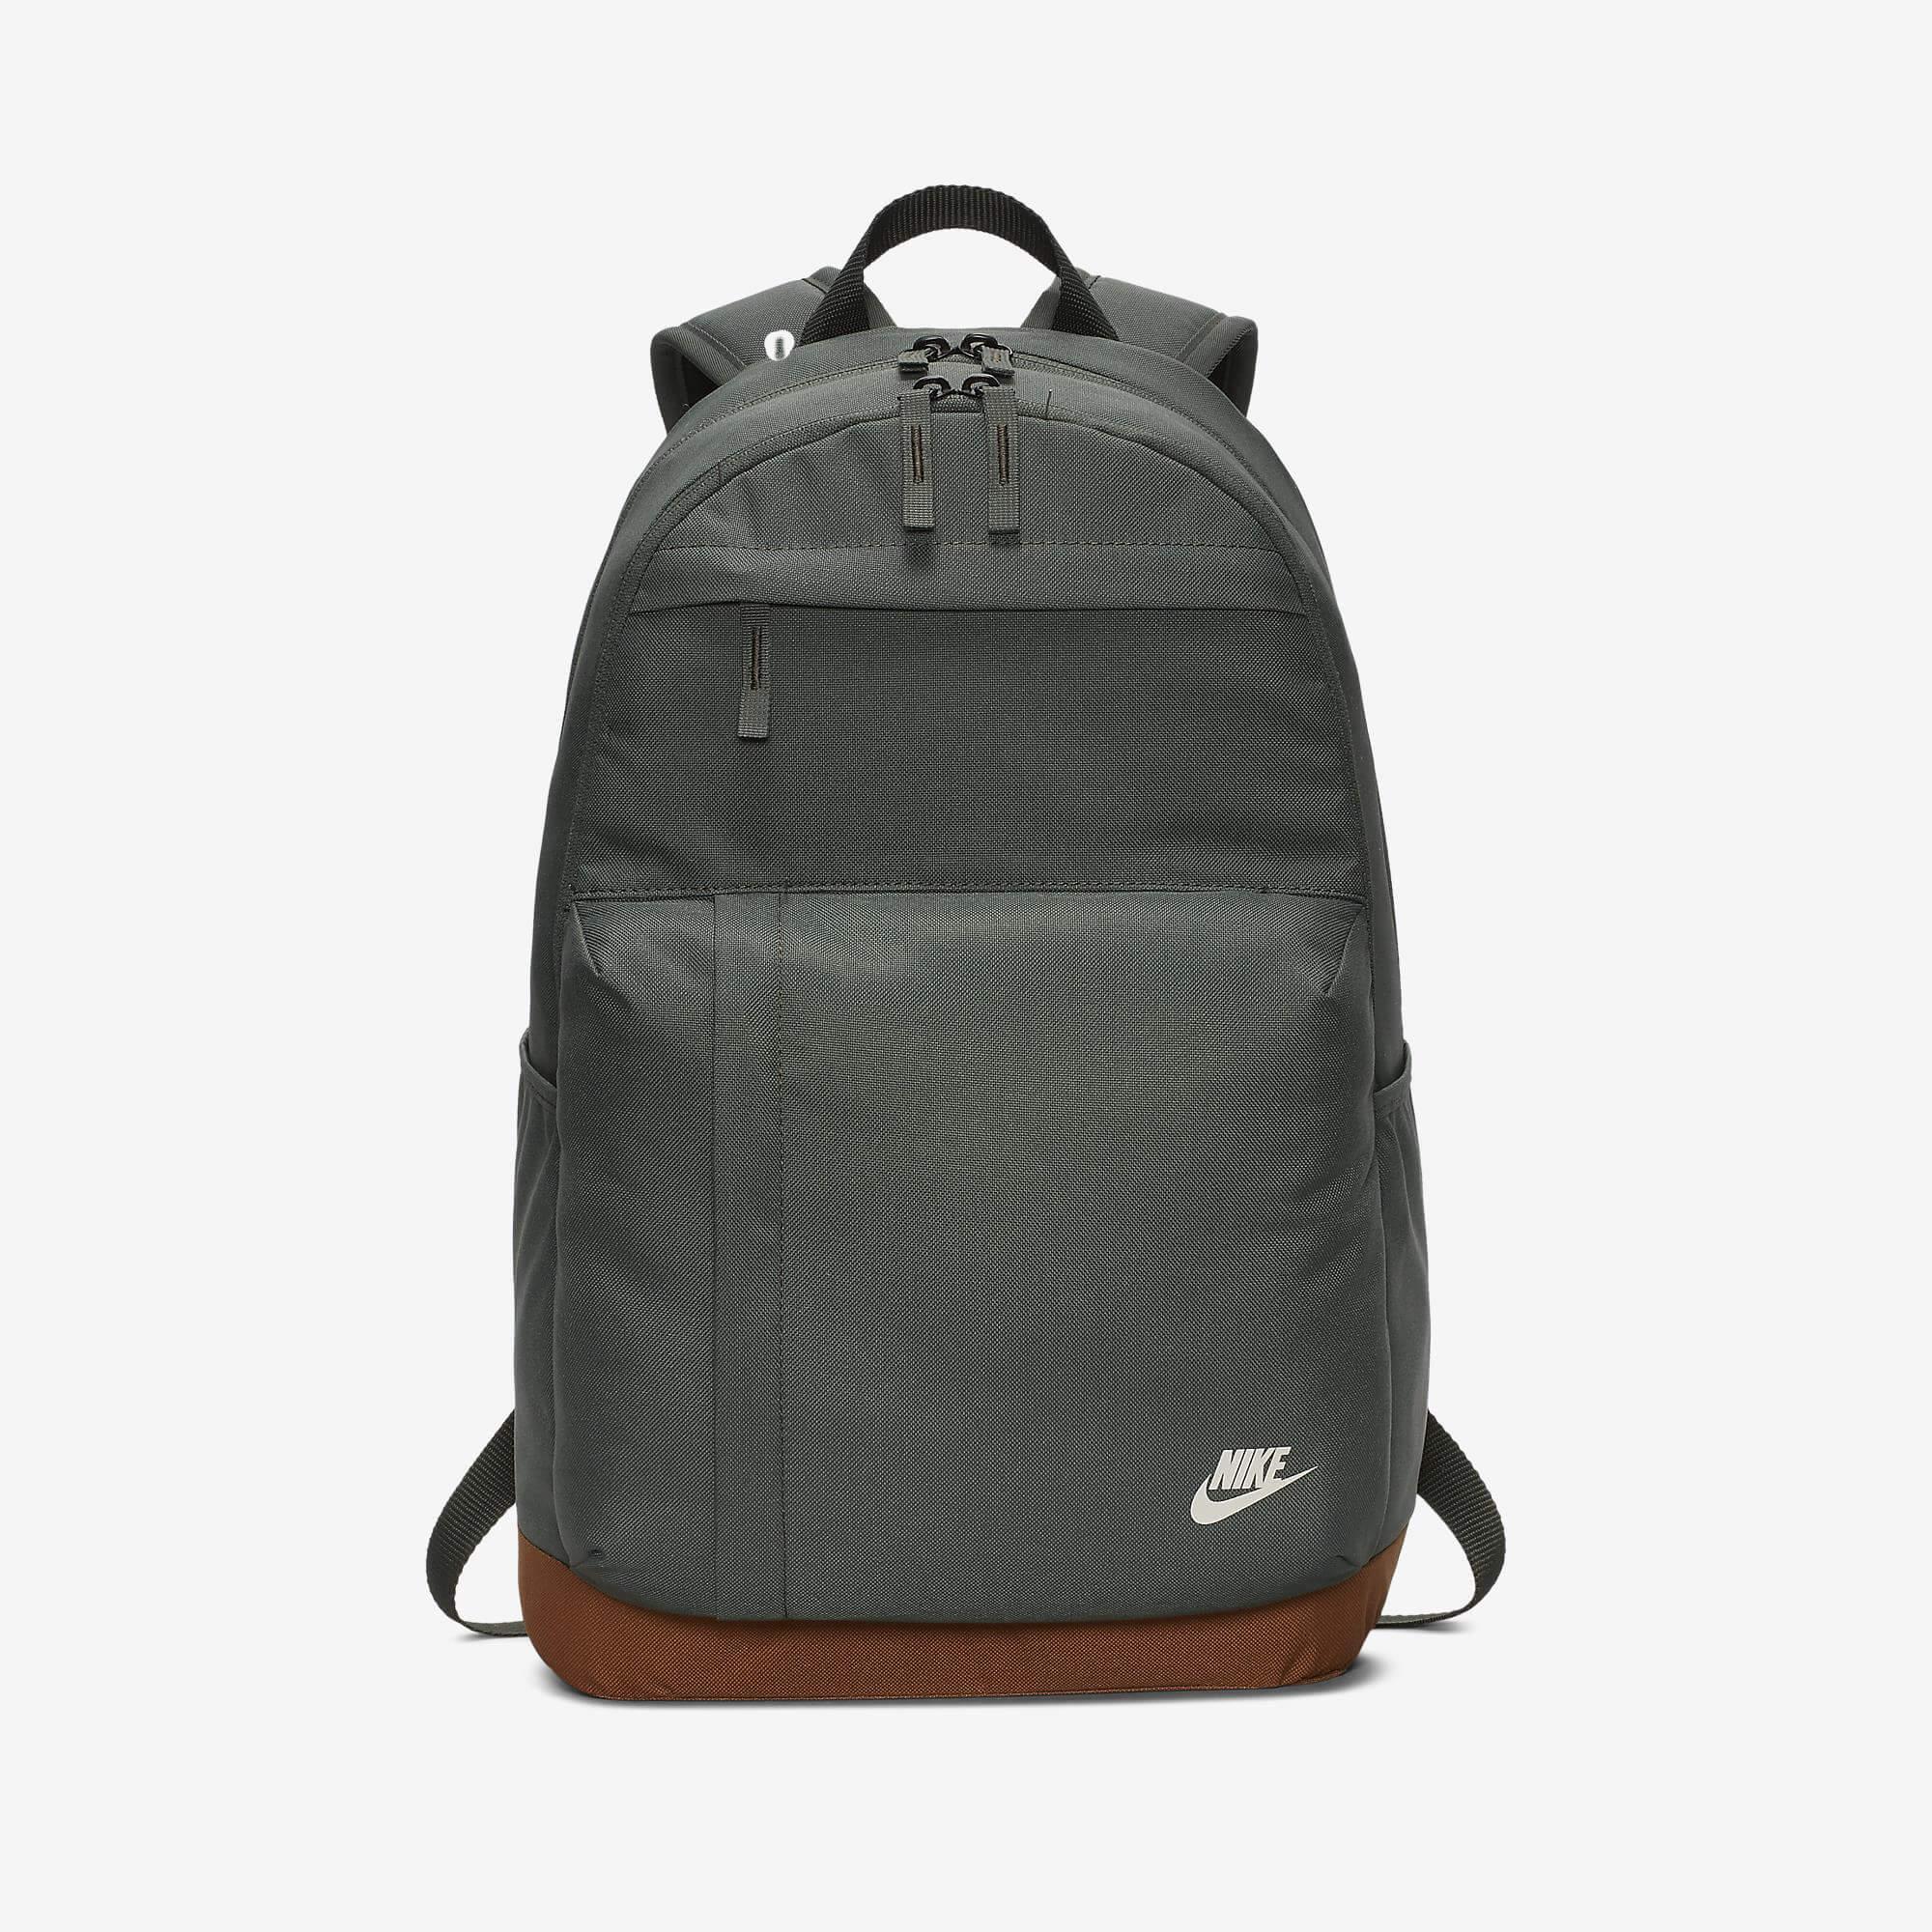 Mochila Nike Elemental Backup - LBR